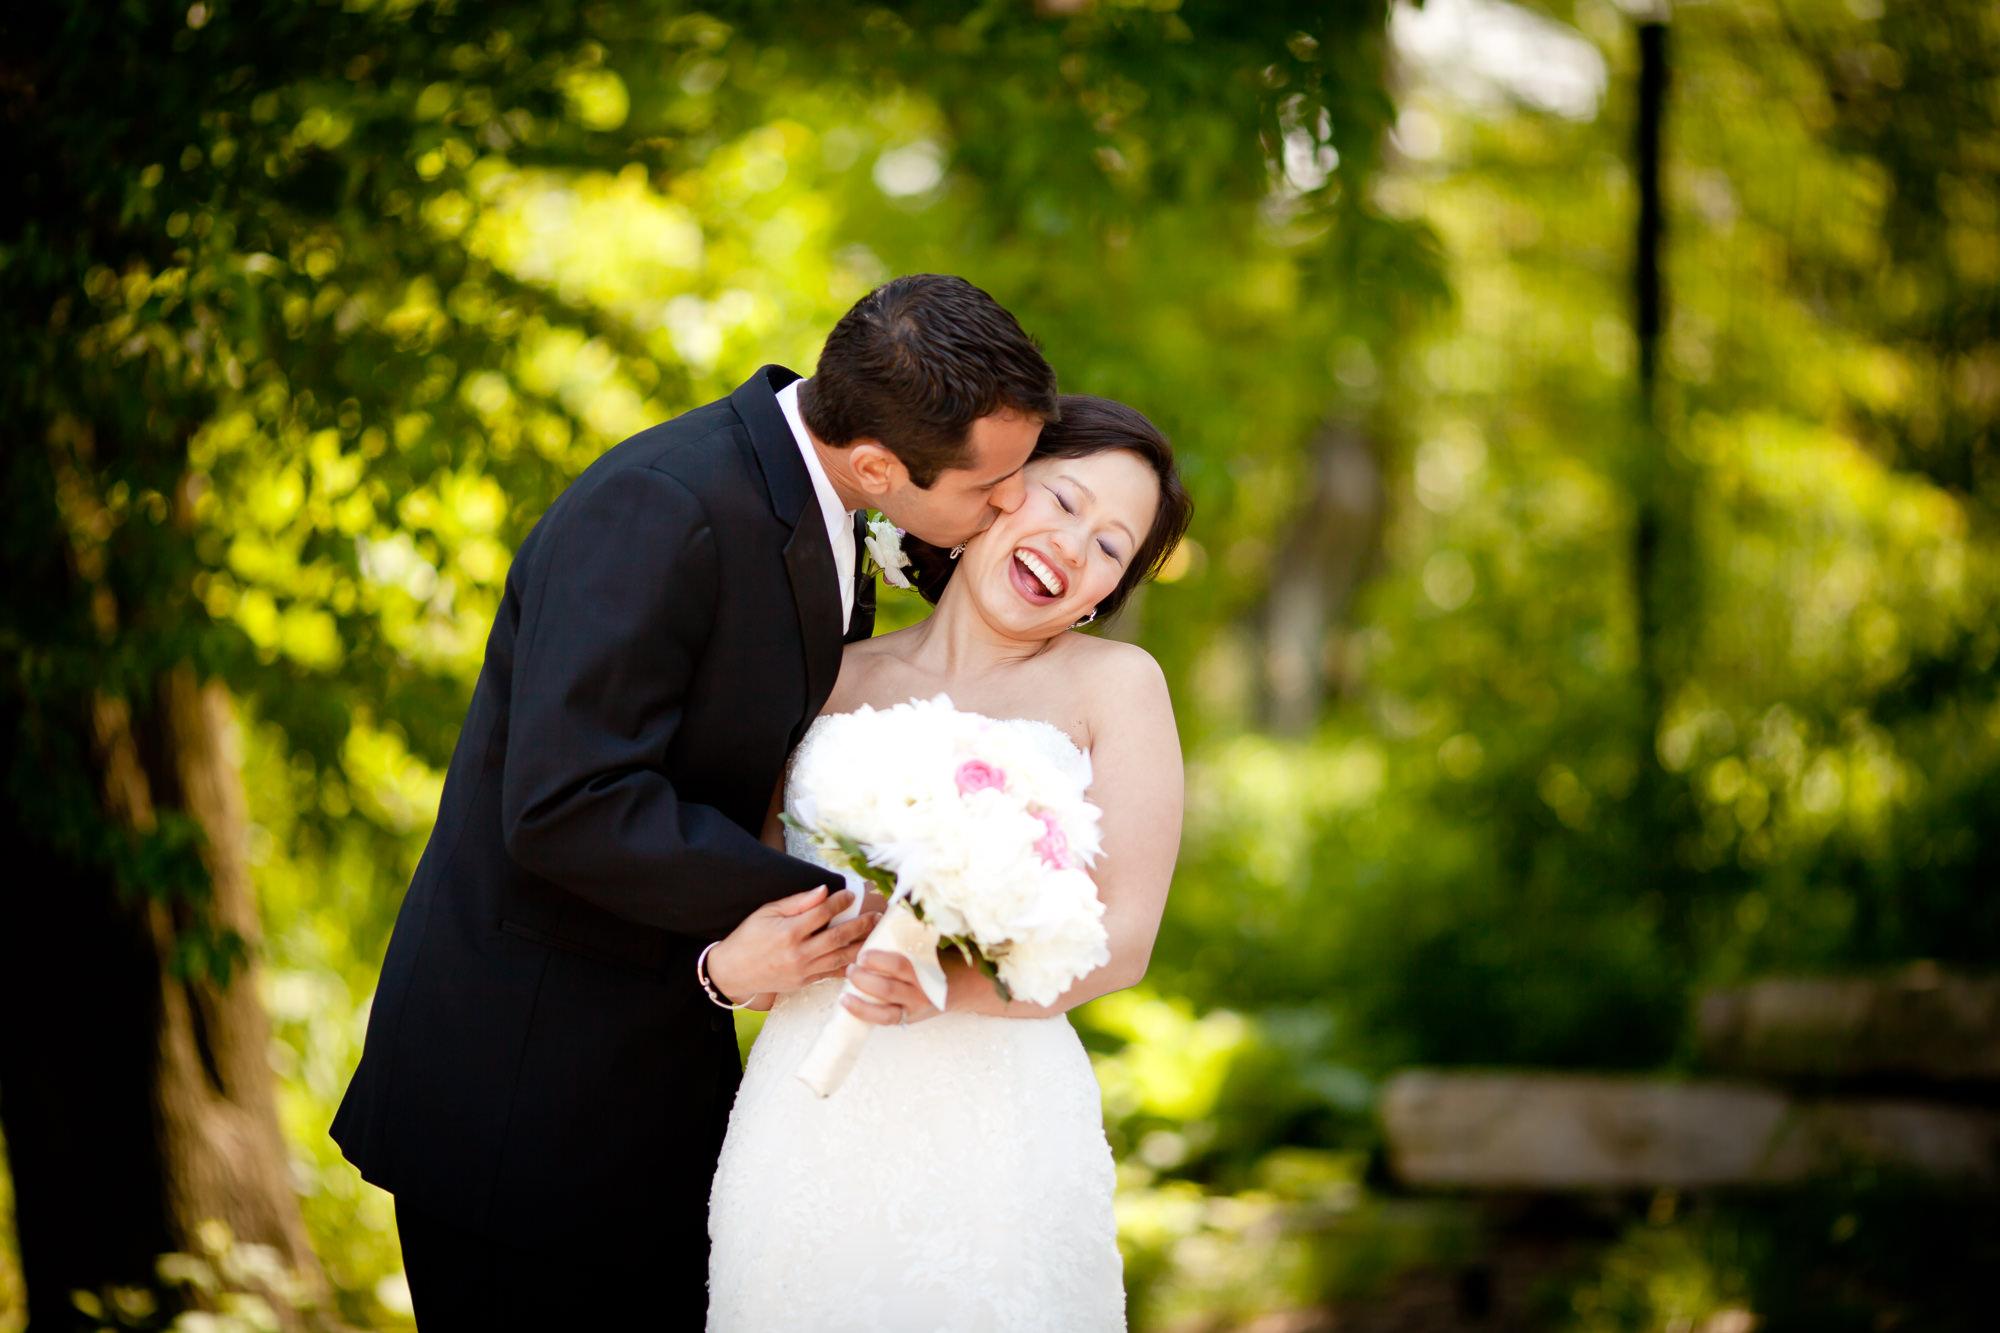 getting married coronavirus chicago laws